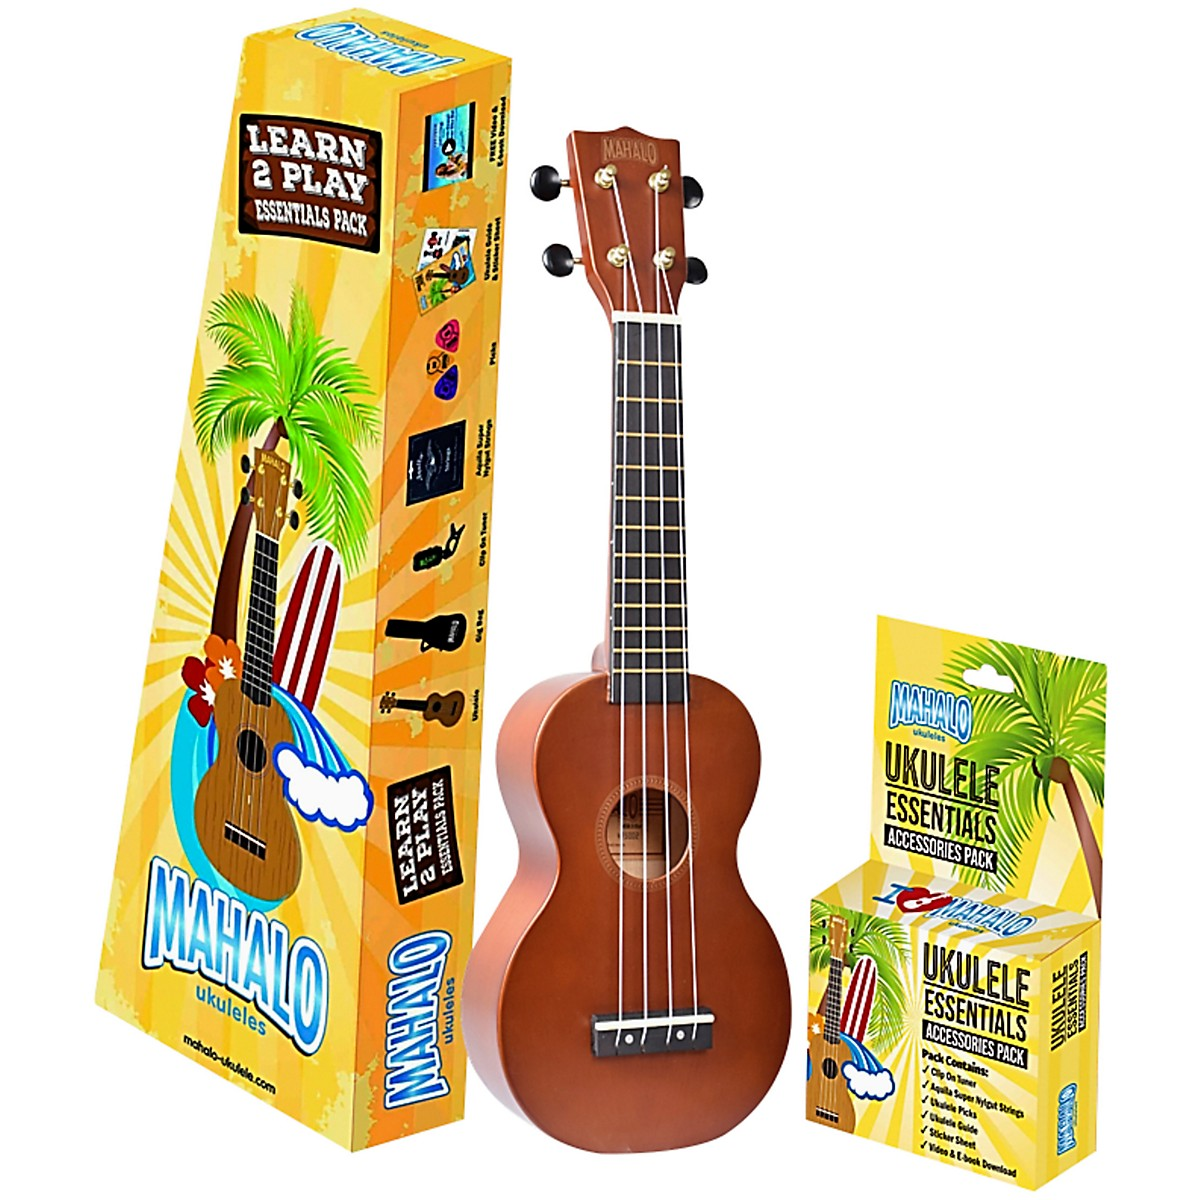 Mahalo Mahalo Rainbow Trans Brown Learn 2 Play Essential Kit